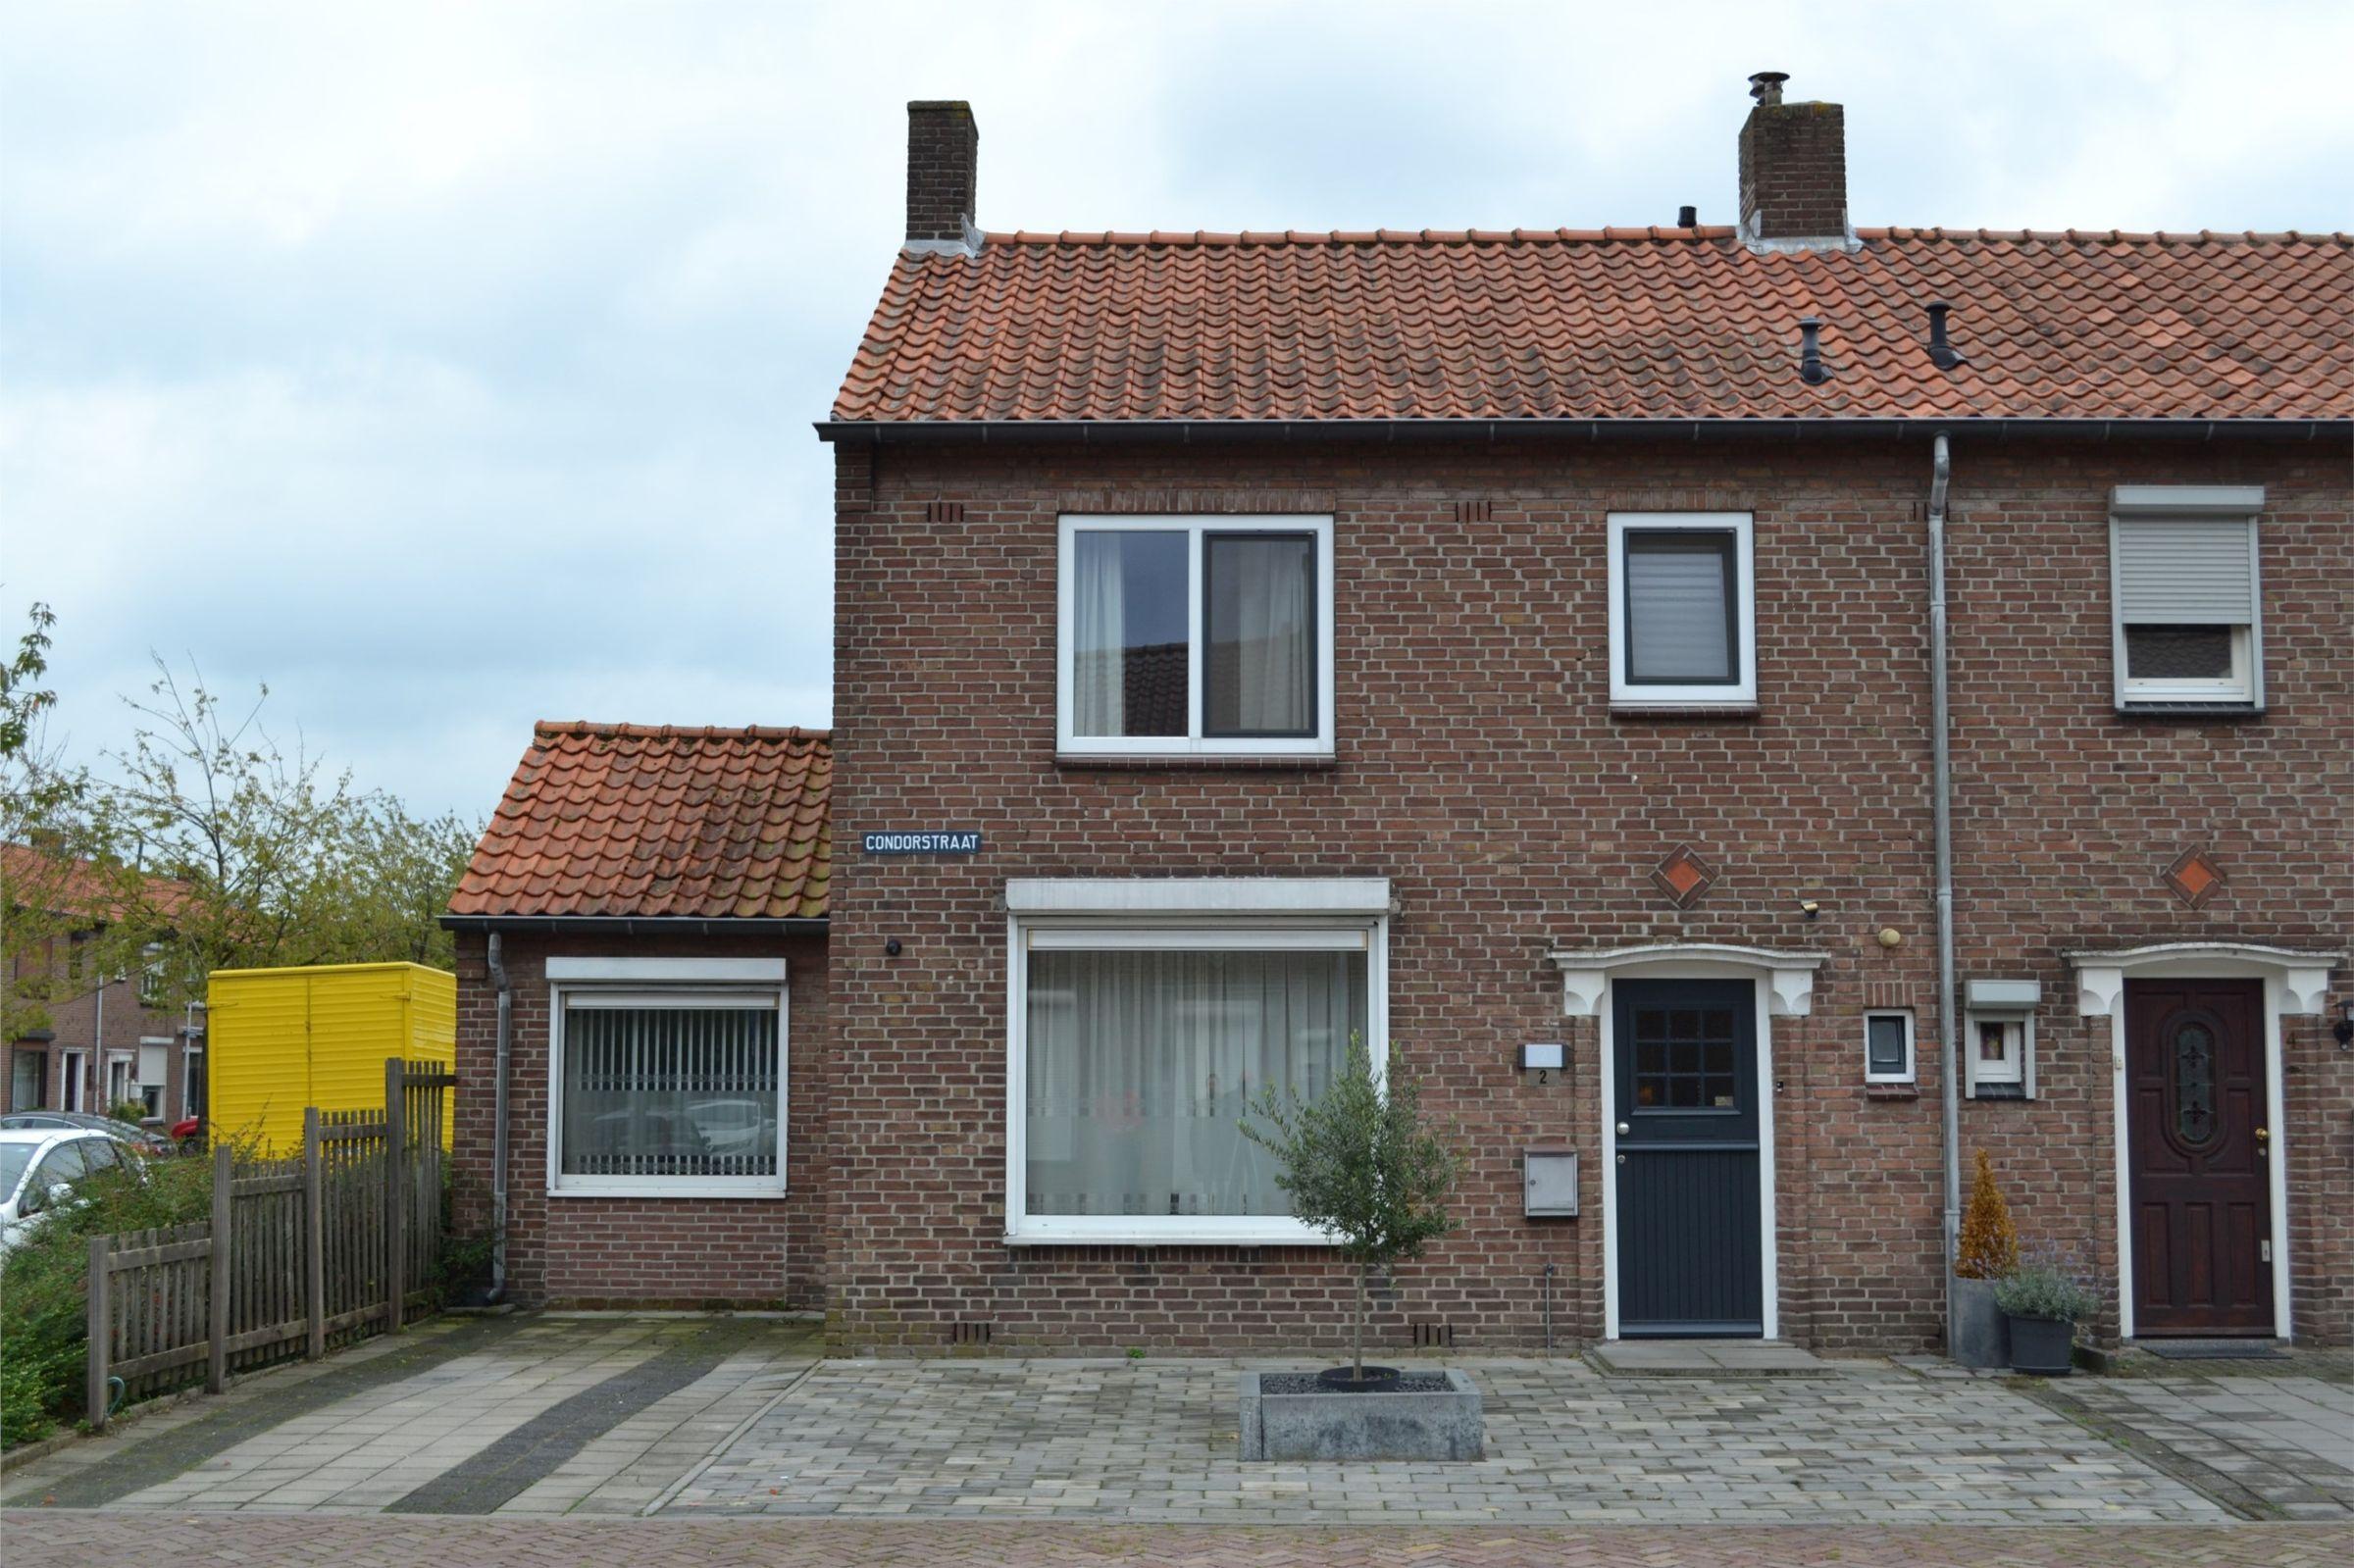 Condorstraat 2, Oss